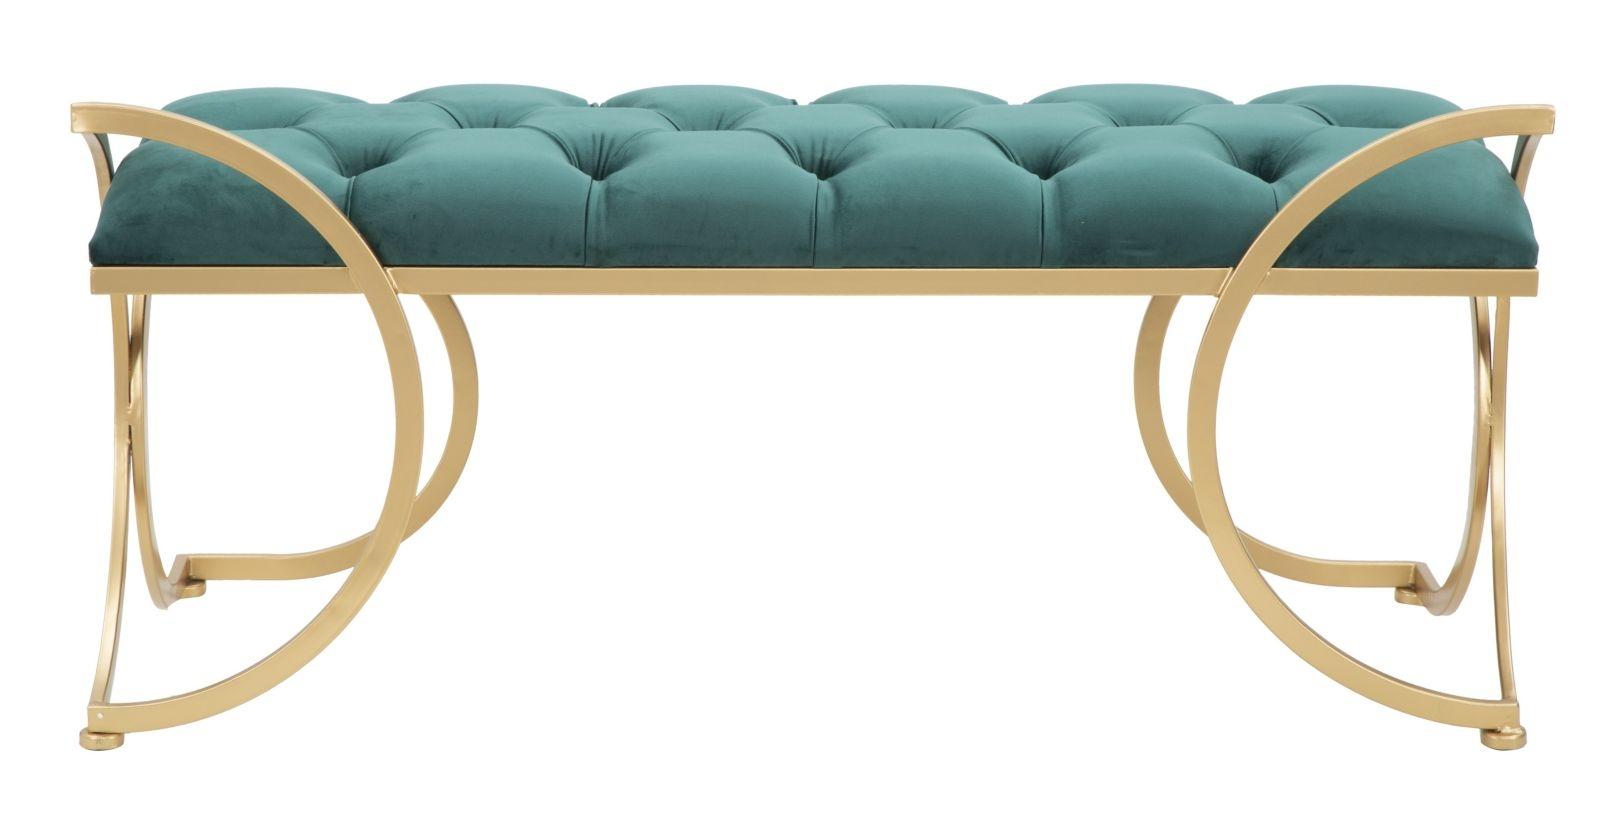 Banca tapitata cu stofa si picioare metalice Luxy Velvet Verde / Auriu, l103xA43xH47 cm imagine